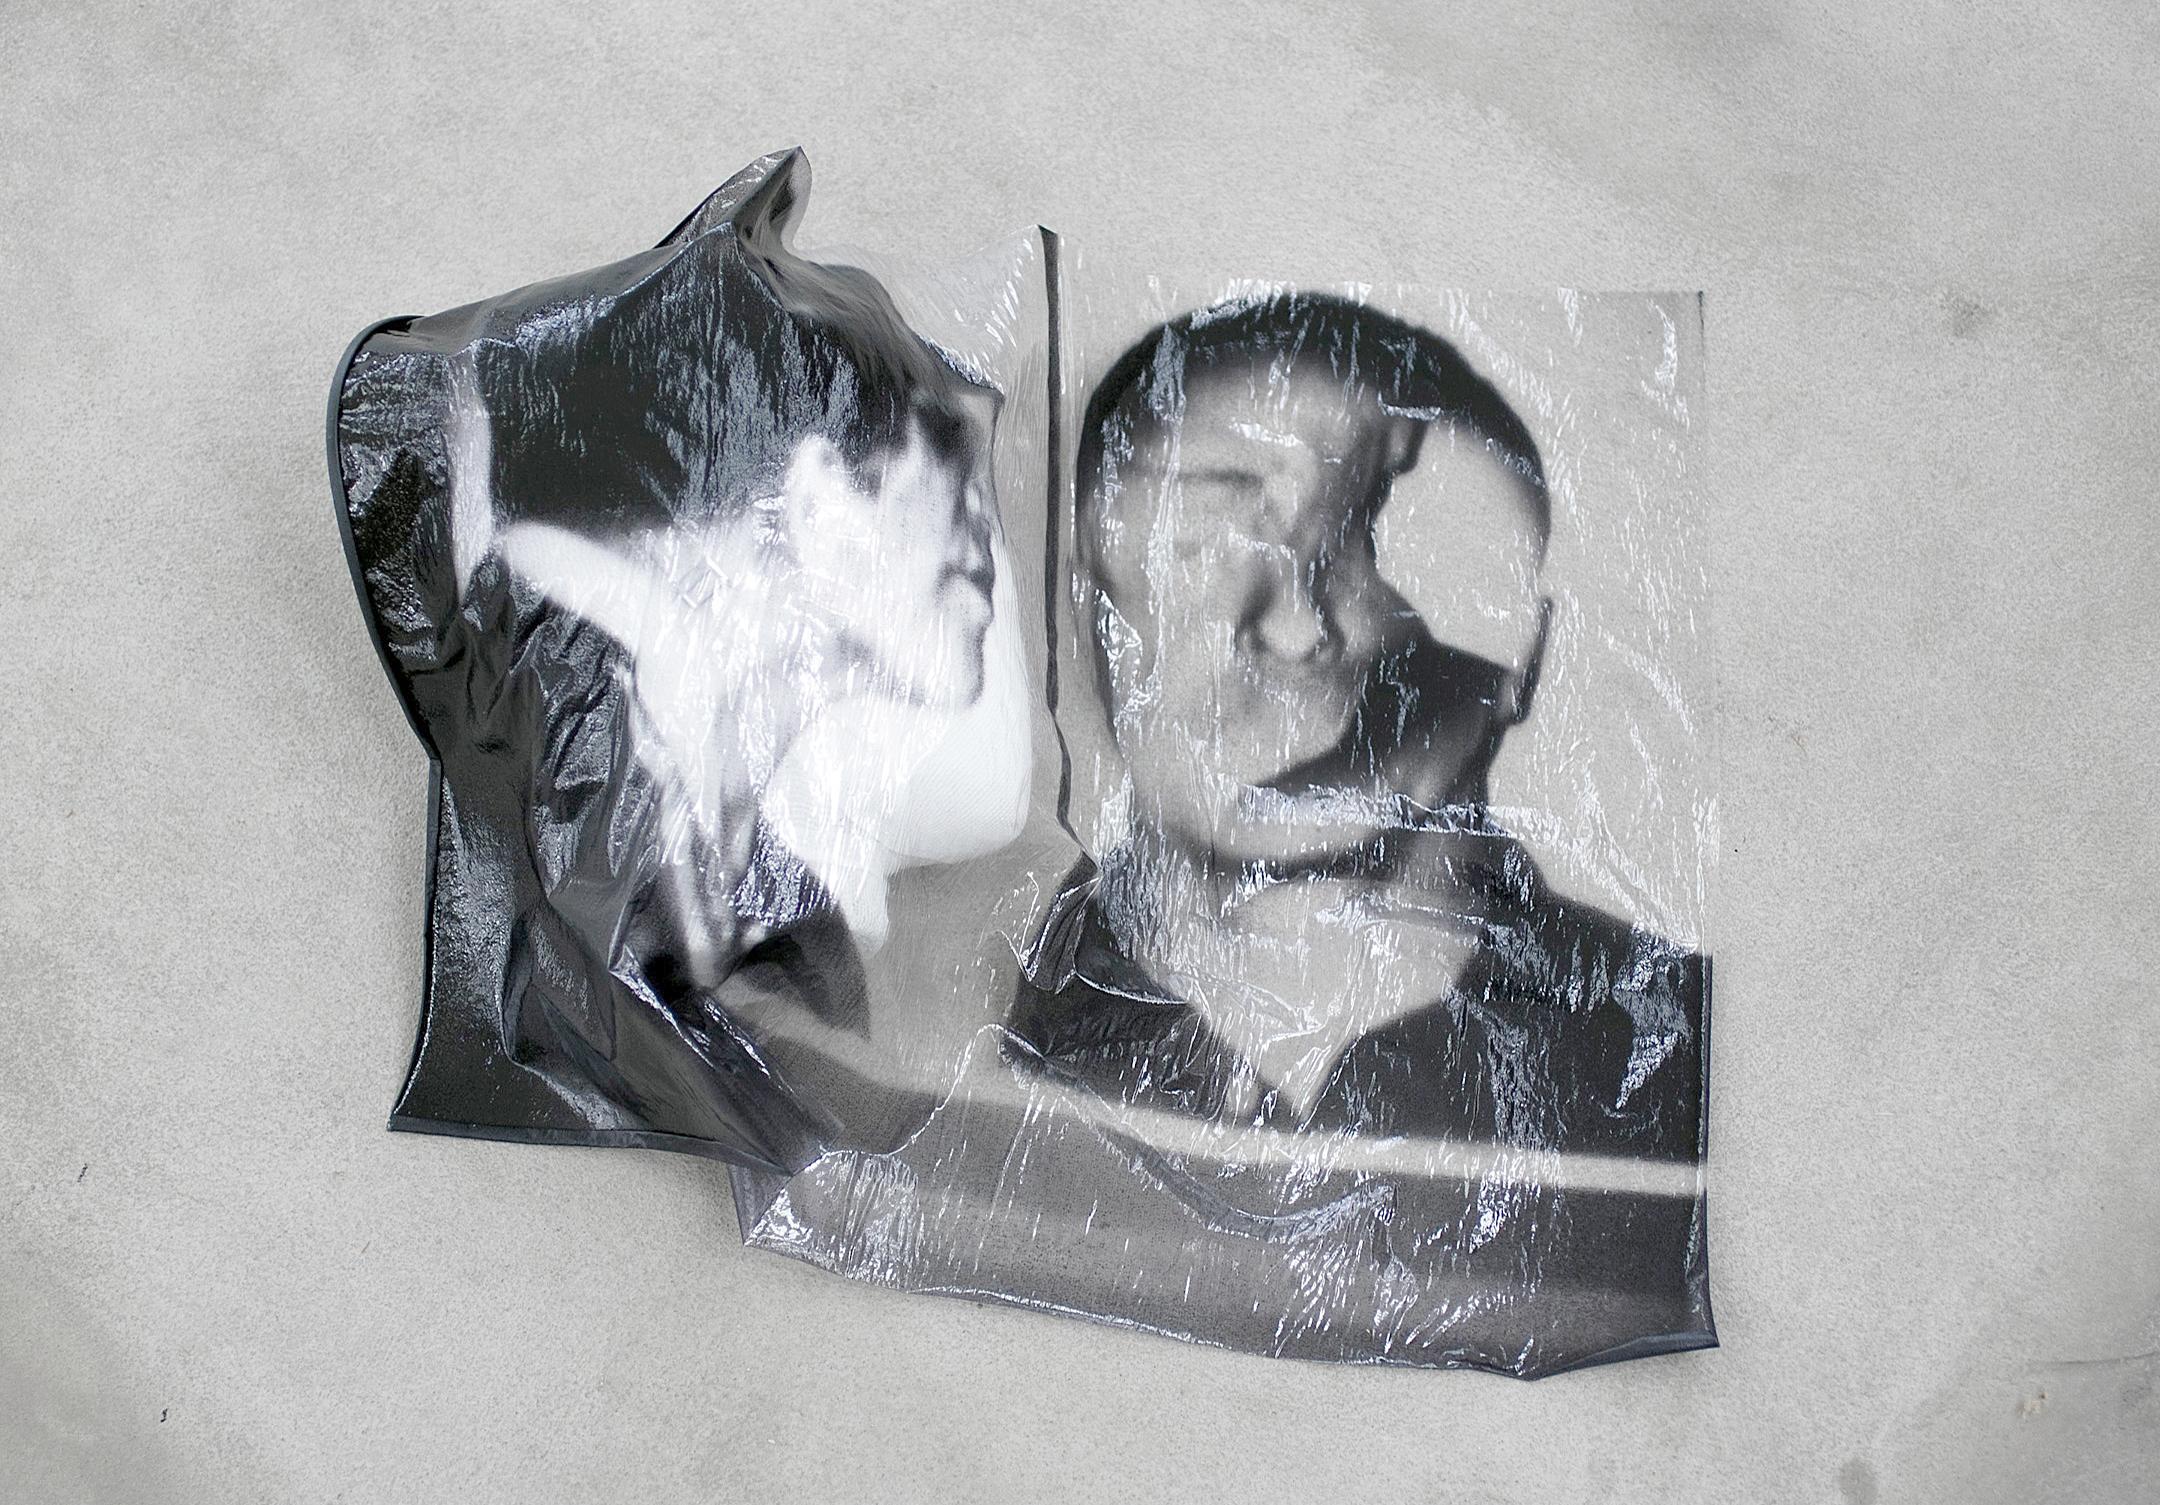 MIND-MATE, 2017, Sculpture,15 x 37 x 40 cm,Inkjet print on plastic, polystyrene, paint, bandage